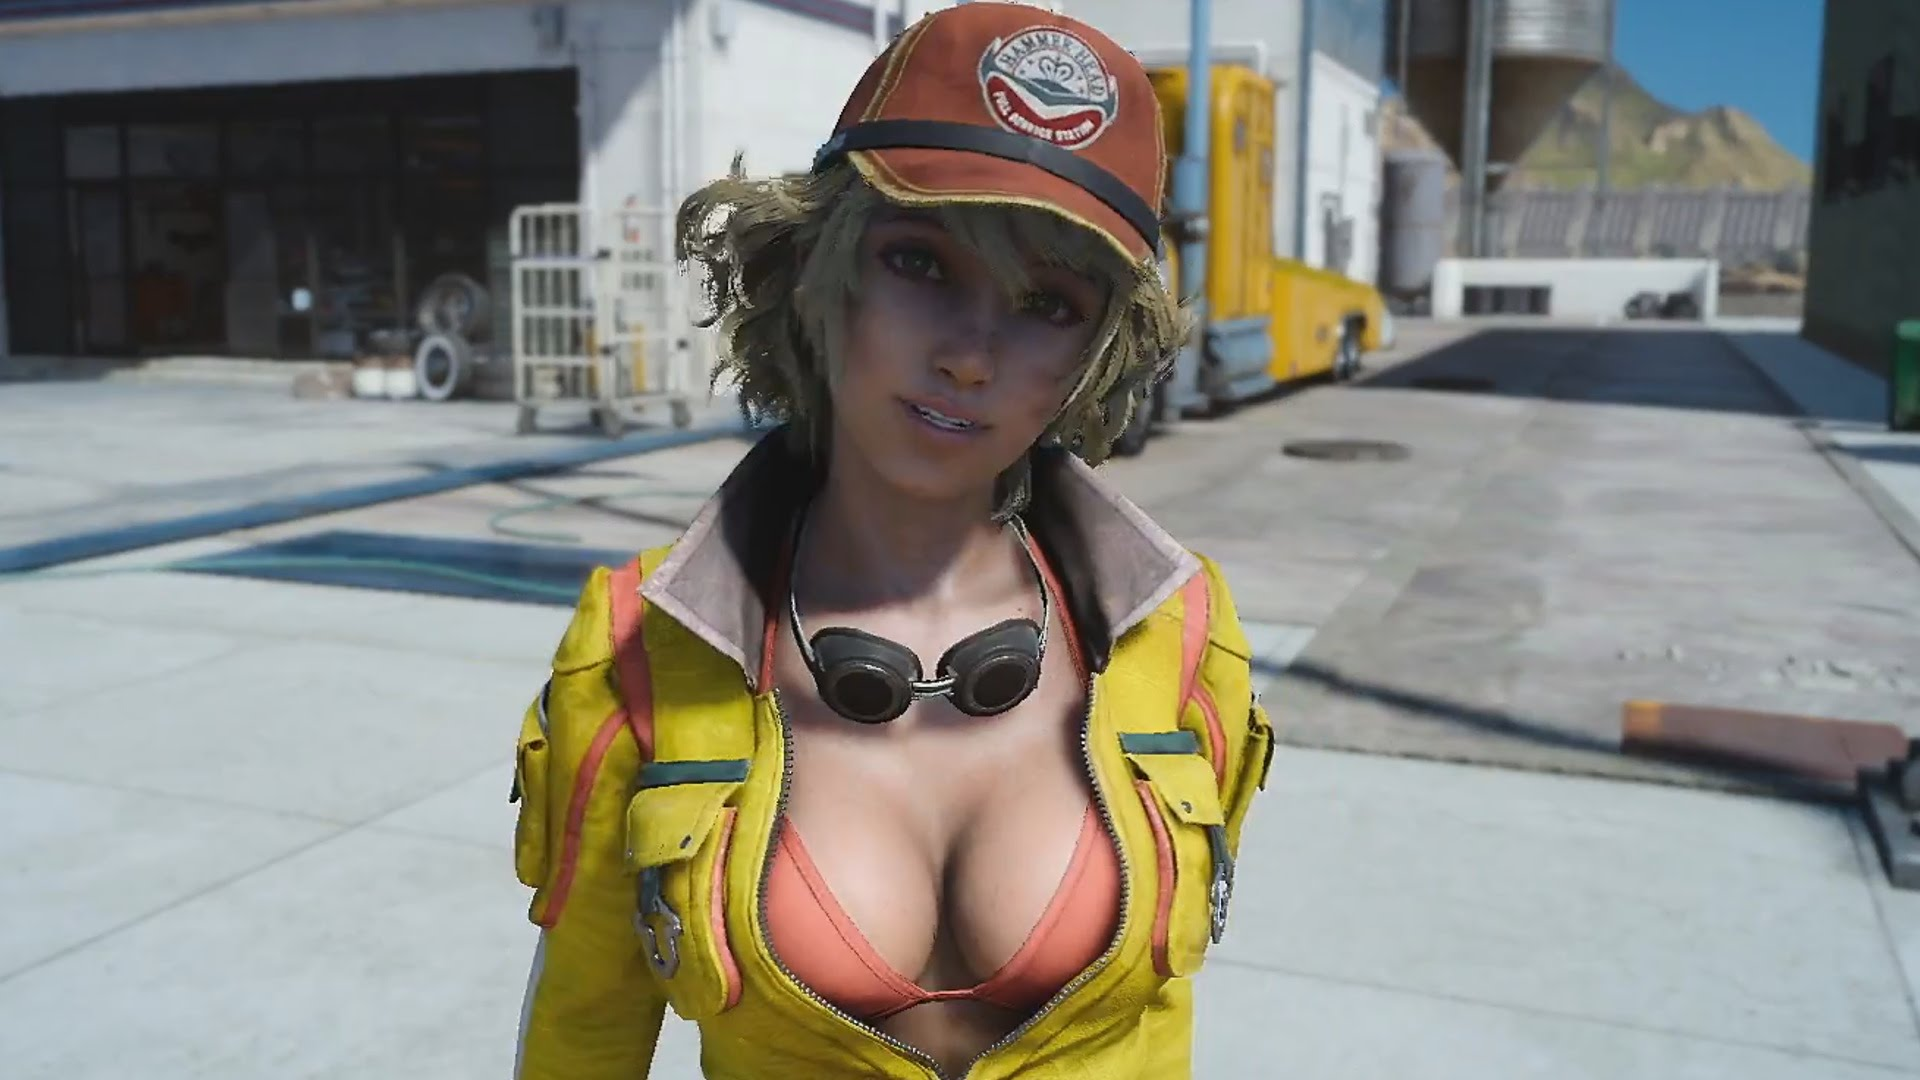 Final Fantasy XV Cindy Image